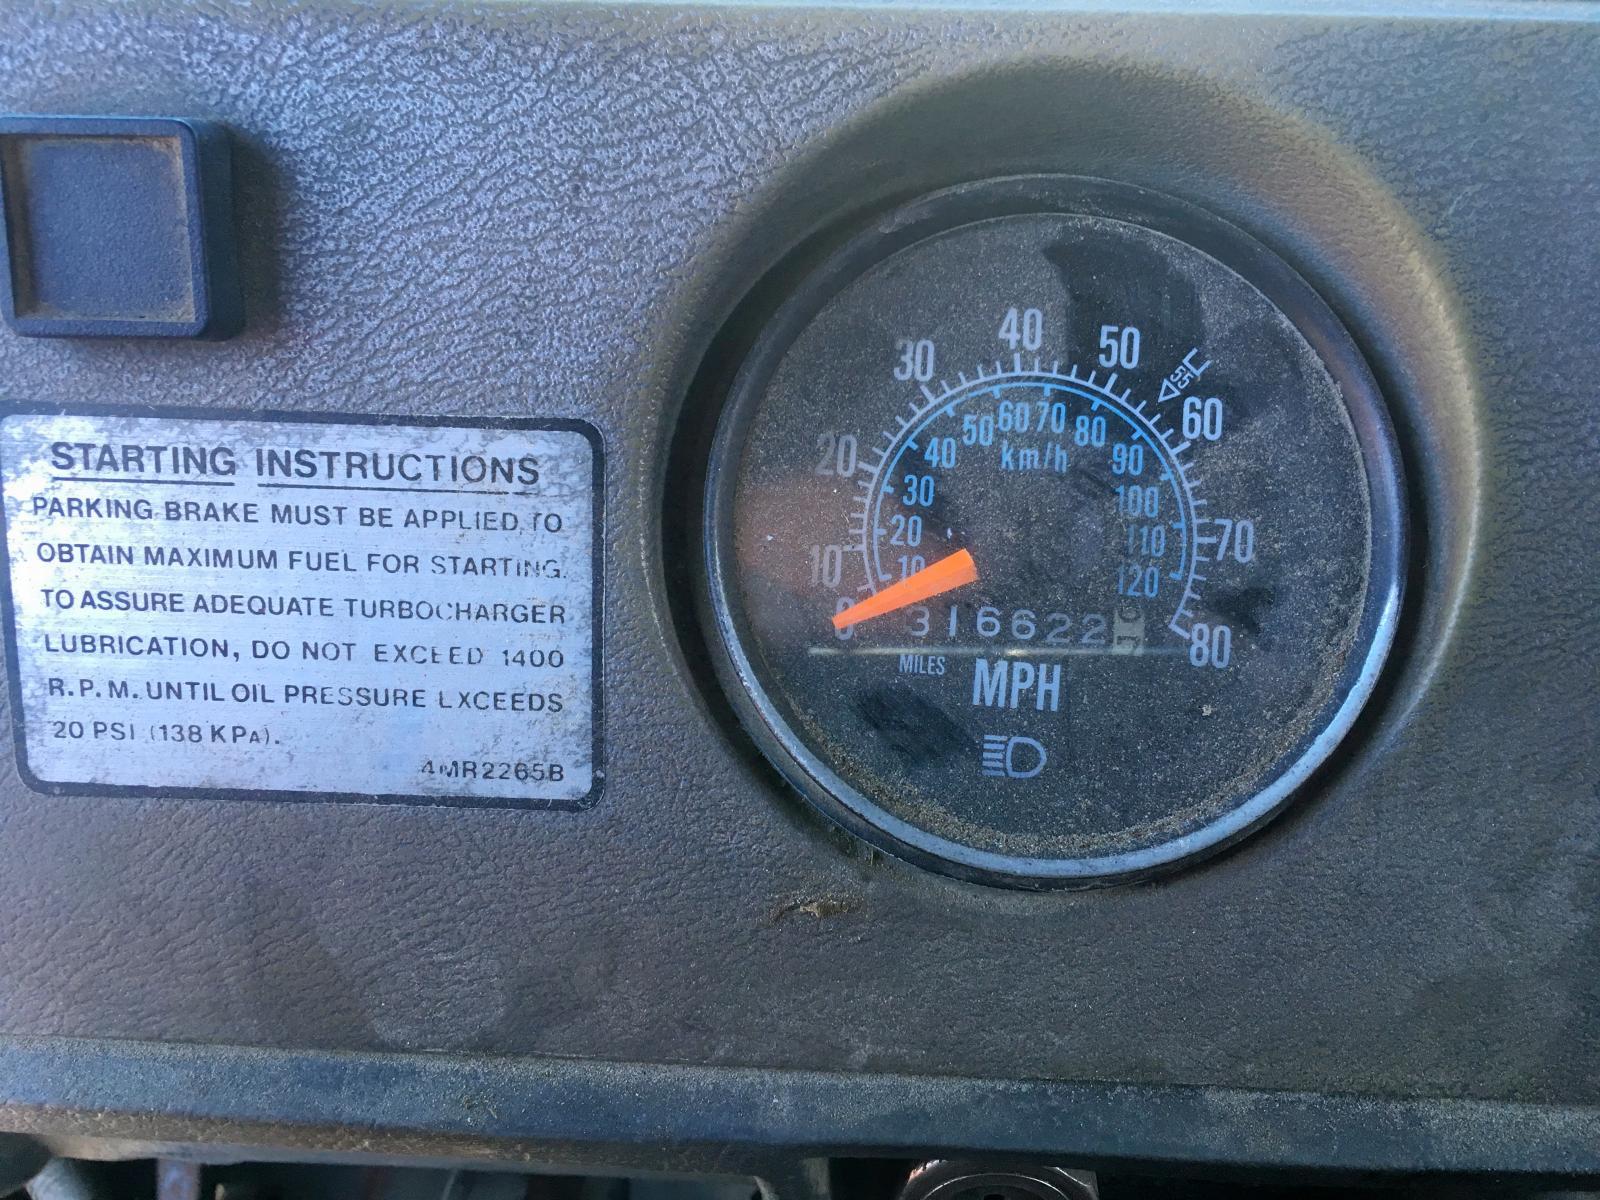 1988 Mack 600 Rd600 6 in MA - South Boston